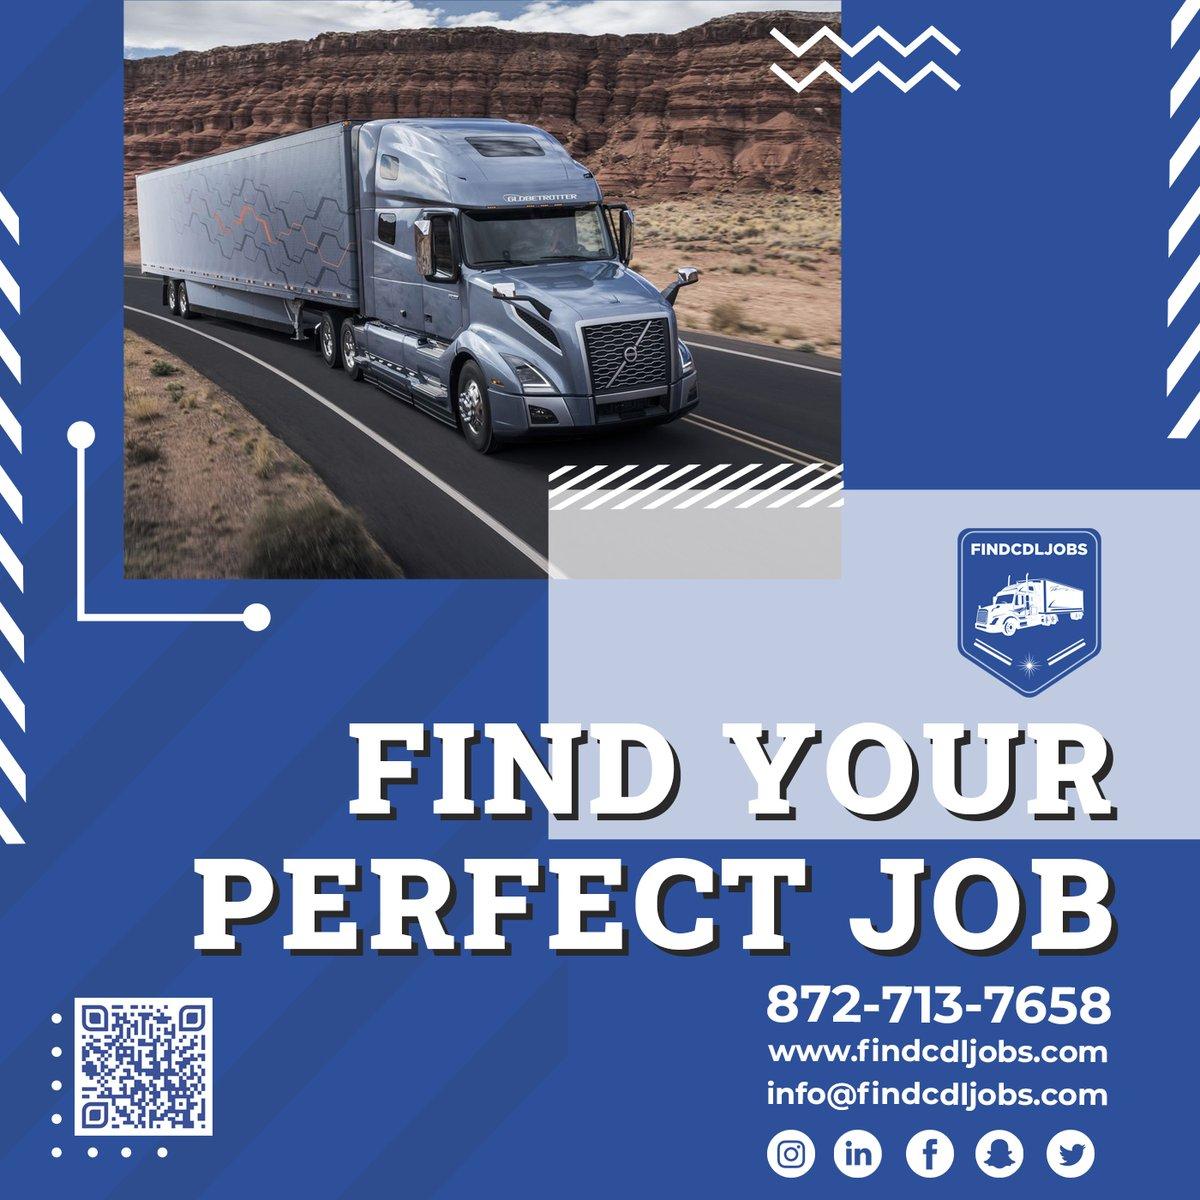 Apply here:  or Call 872-713-7658  #staysafe #findcdljobs #cdl #cdljobs #truckdrivers #trucks #truckerslife #usaroads #thankyou #cdldriver #trucksusa #trucklife #truckdriver #recruitment #wearehiring #application #applynow #job #trucker #work